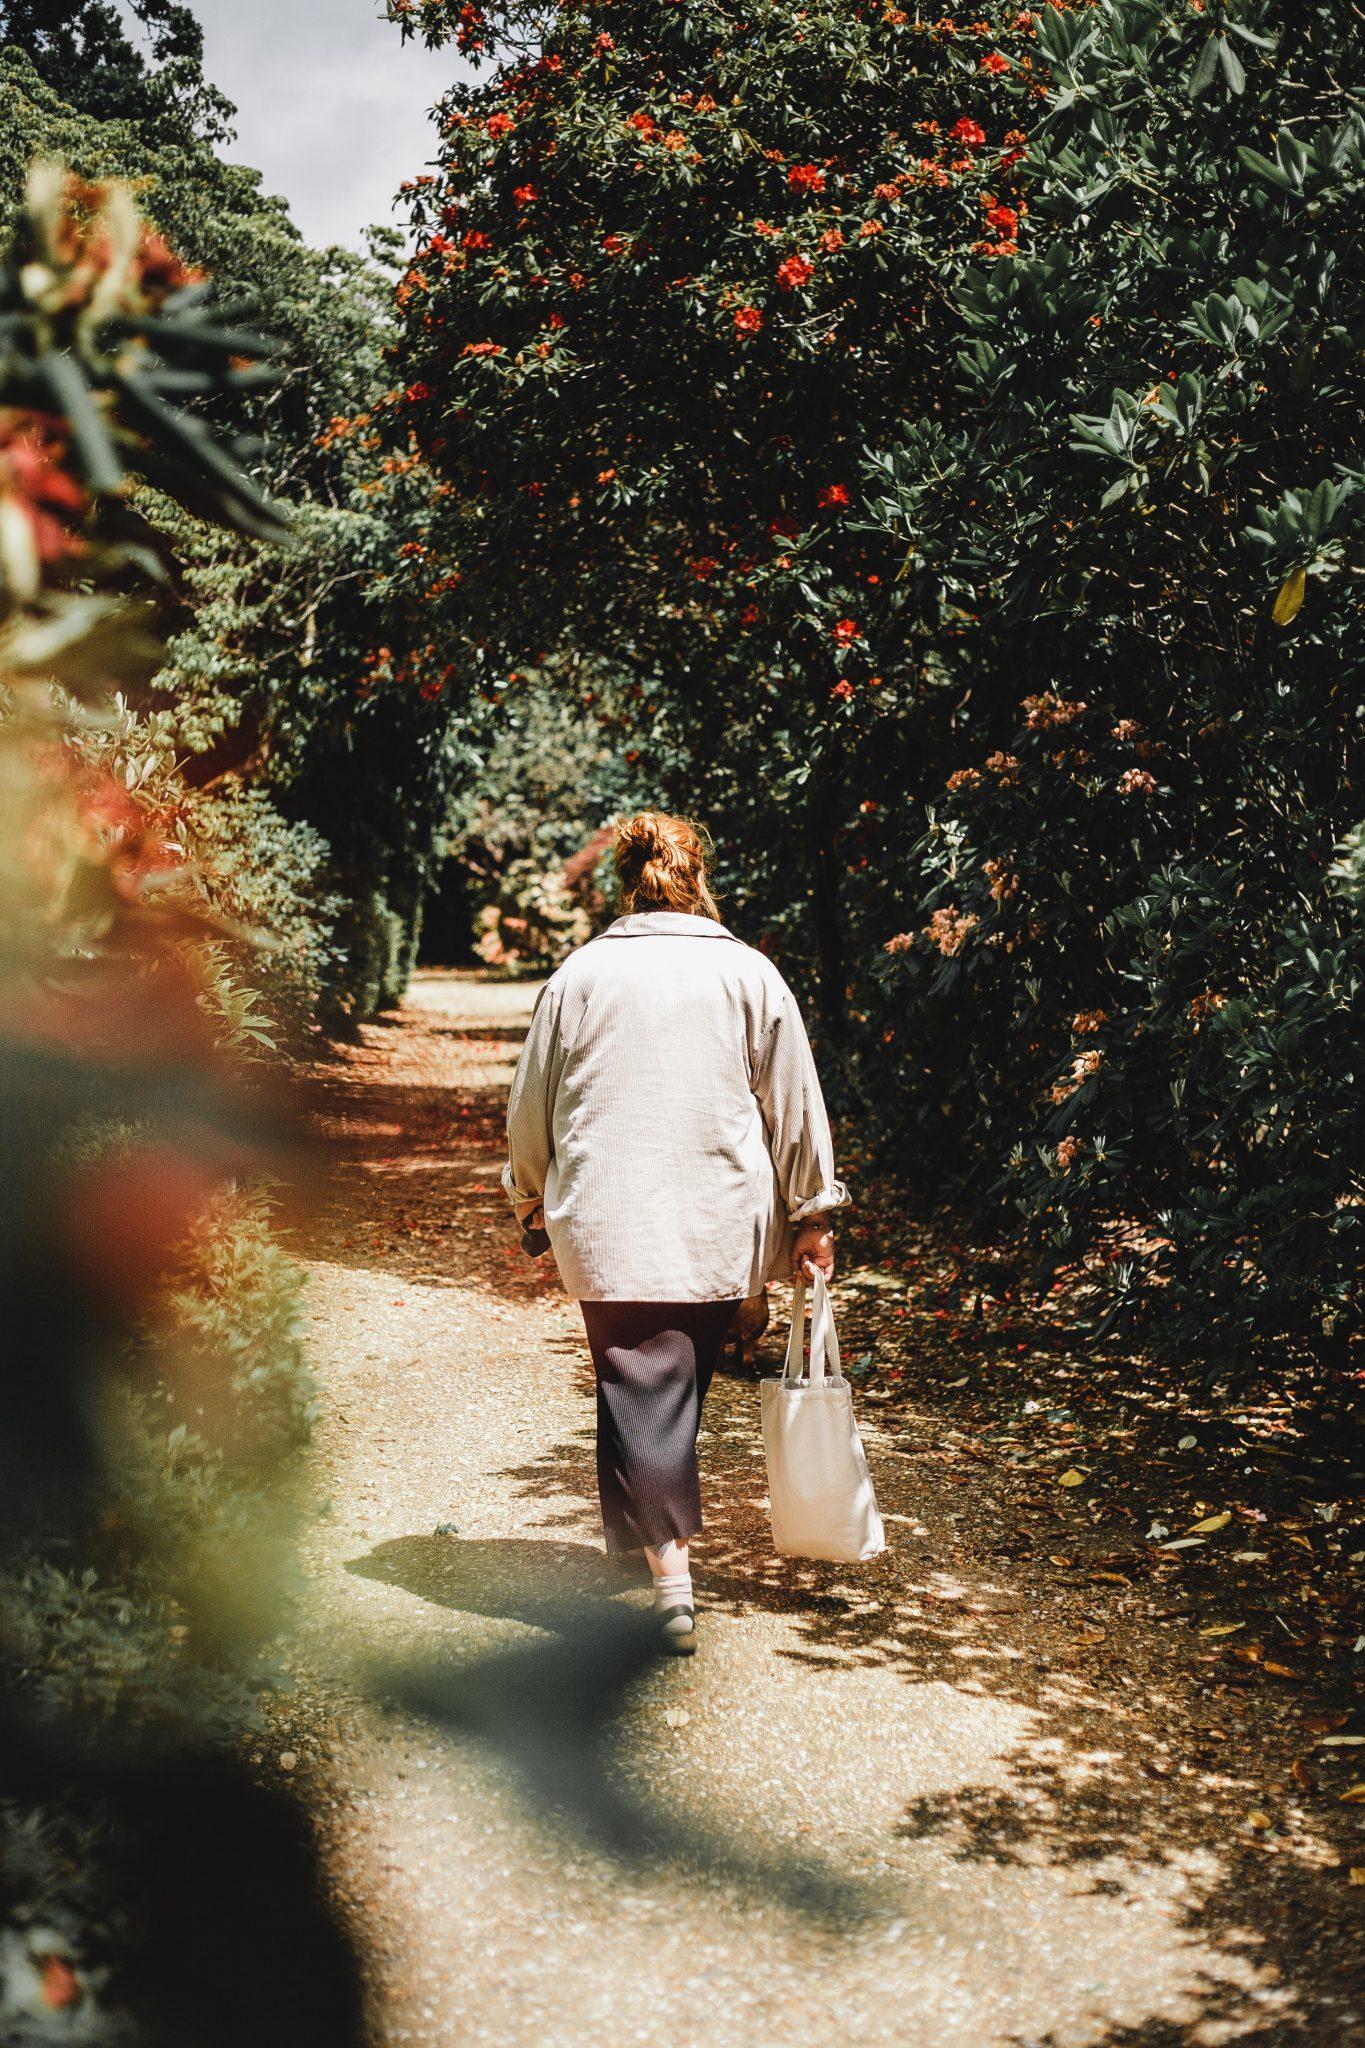 Walk faster, age slower